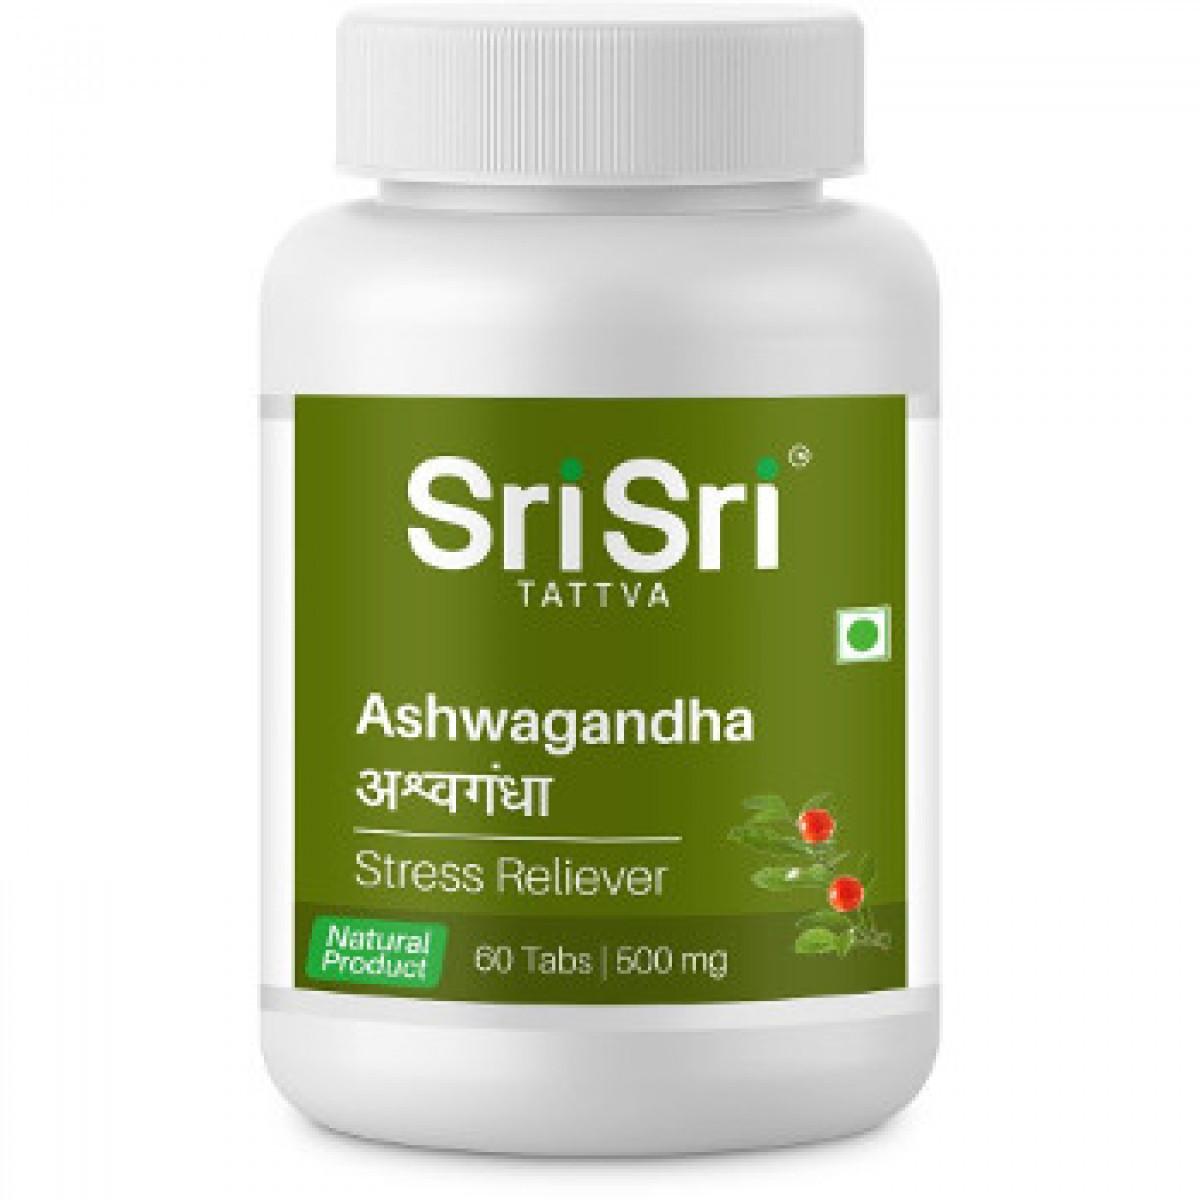 Ашваганда 60 таблеток, Sri Sri Tattva, наделяет организм физической и умственной силой,